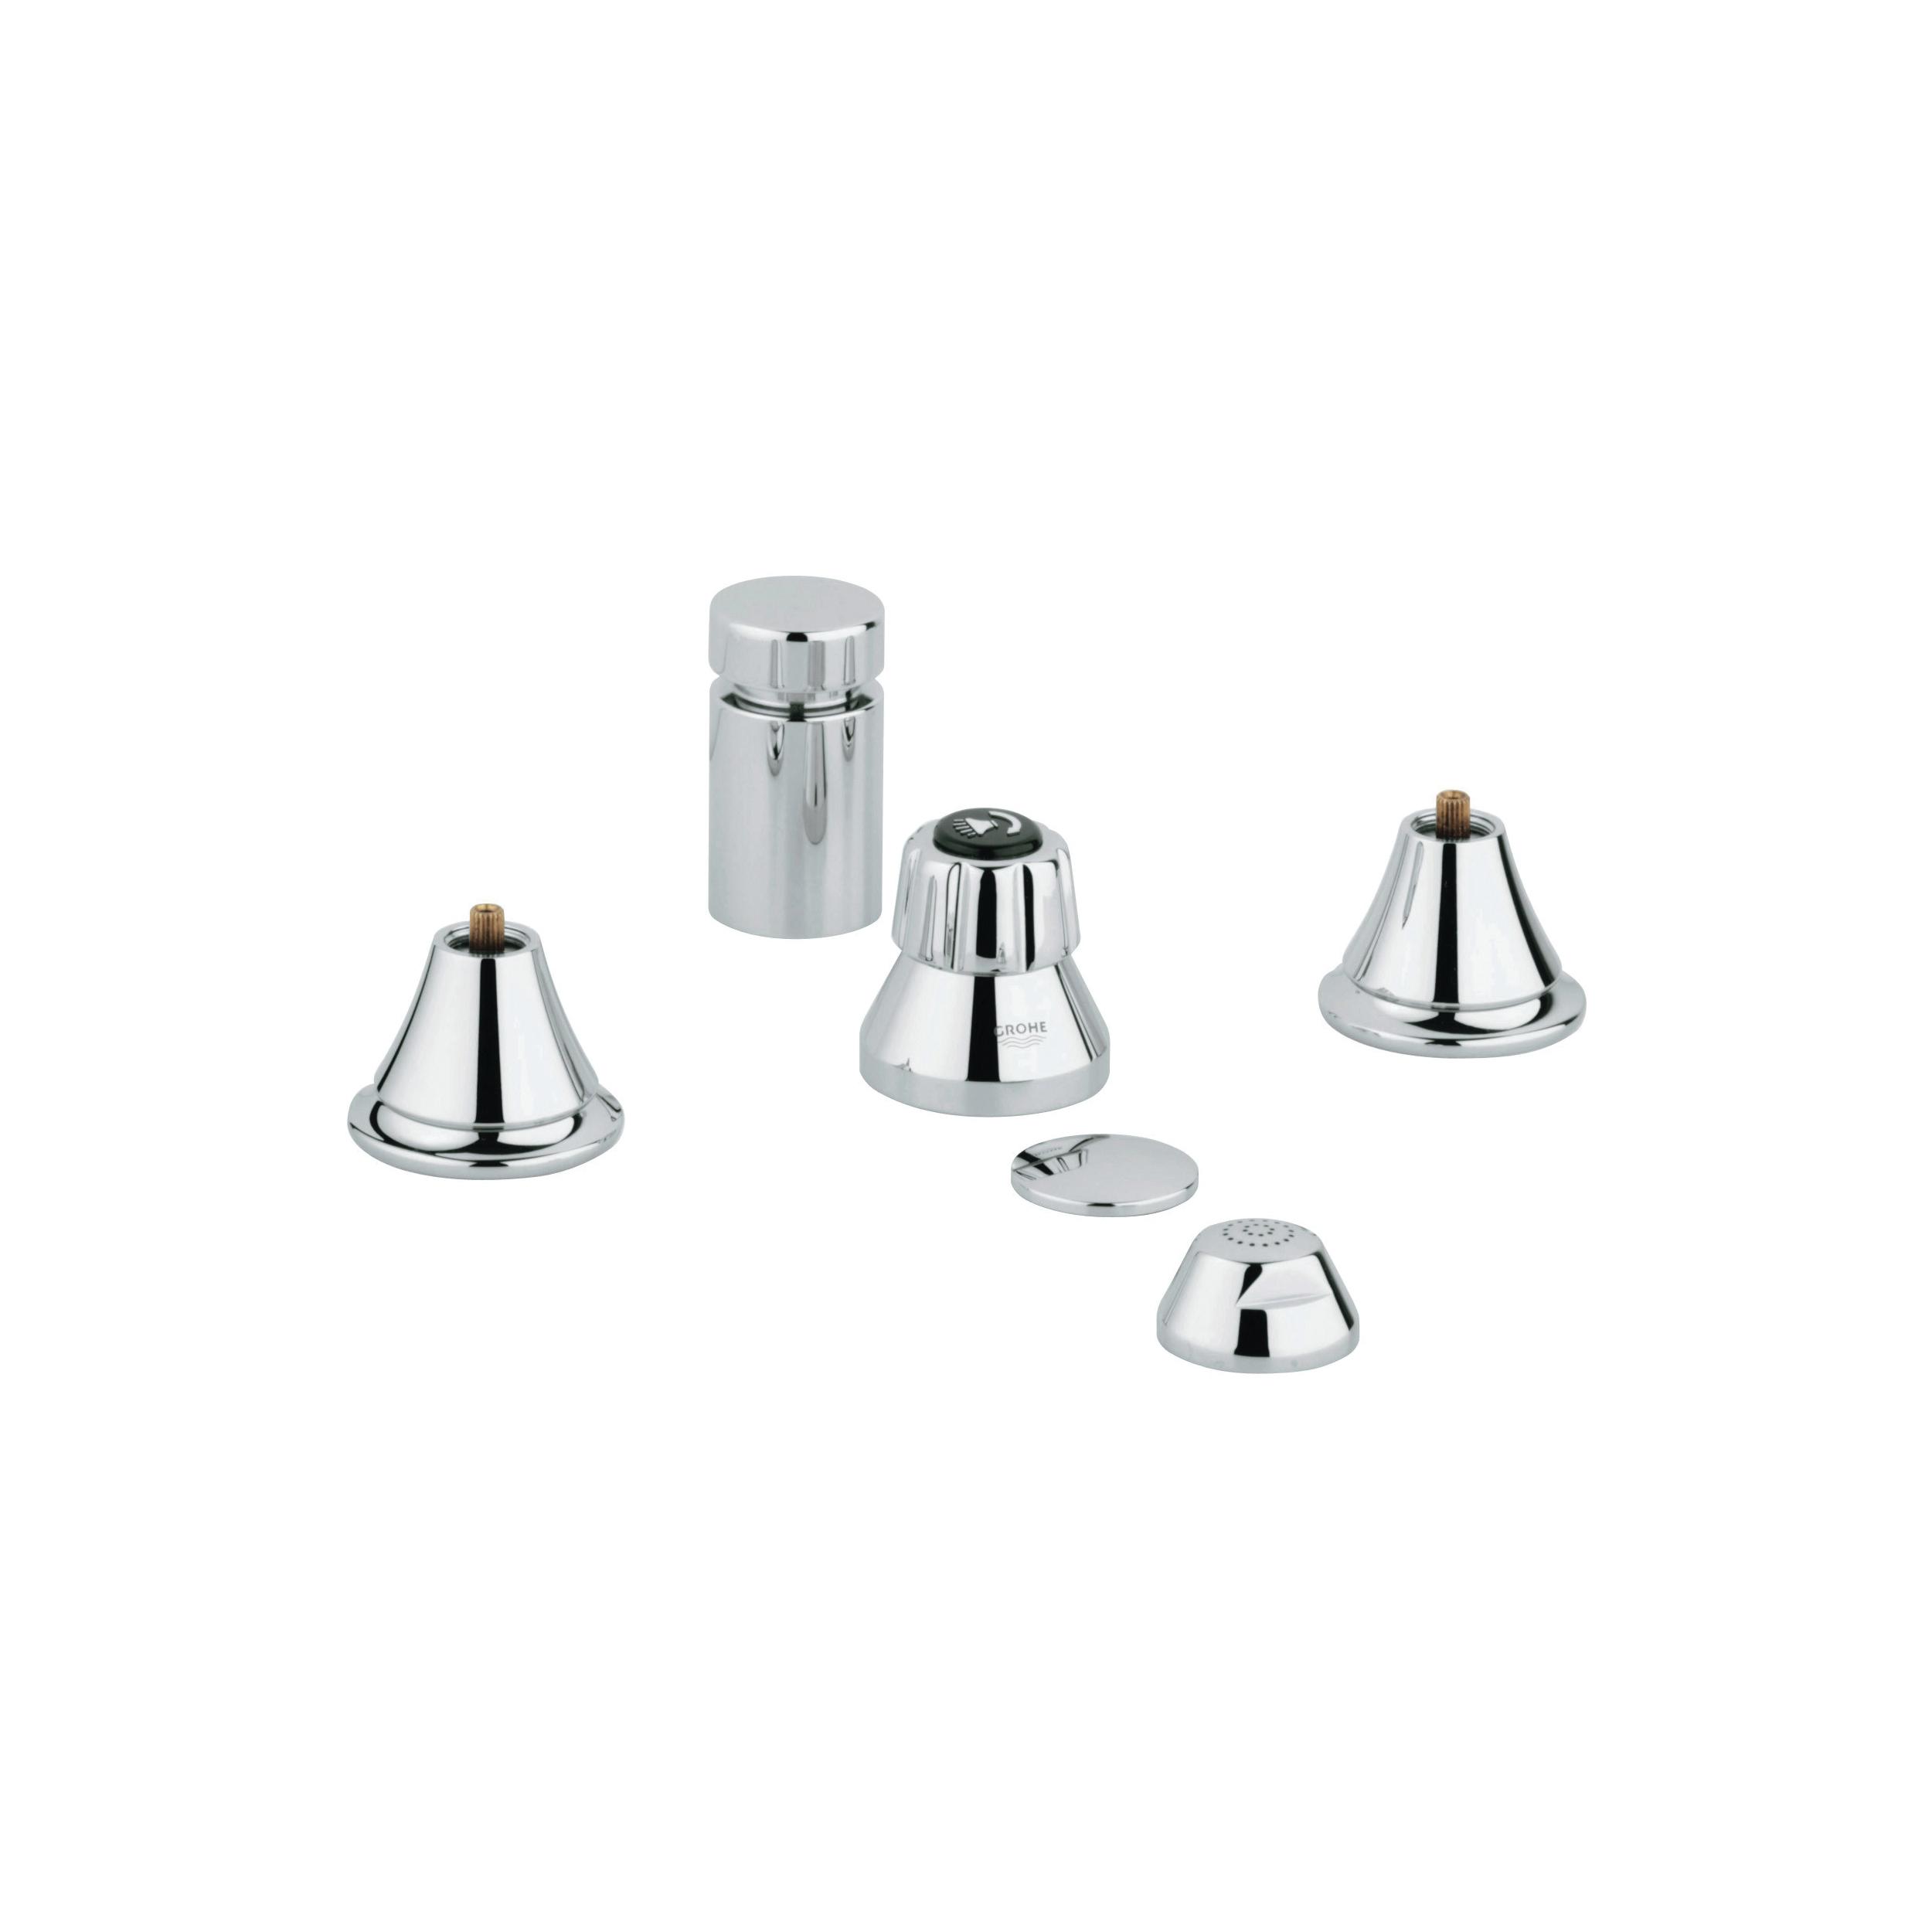 GROHE 24020000 Wideset Bidet Faucet, Seabury™, StarLight® Polished Chrome, Import